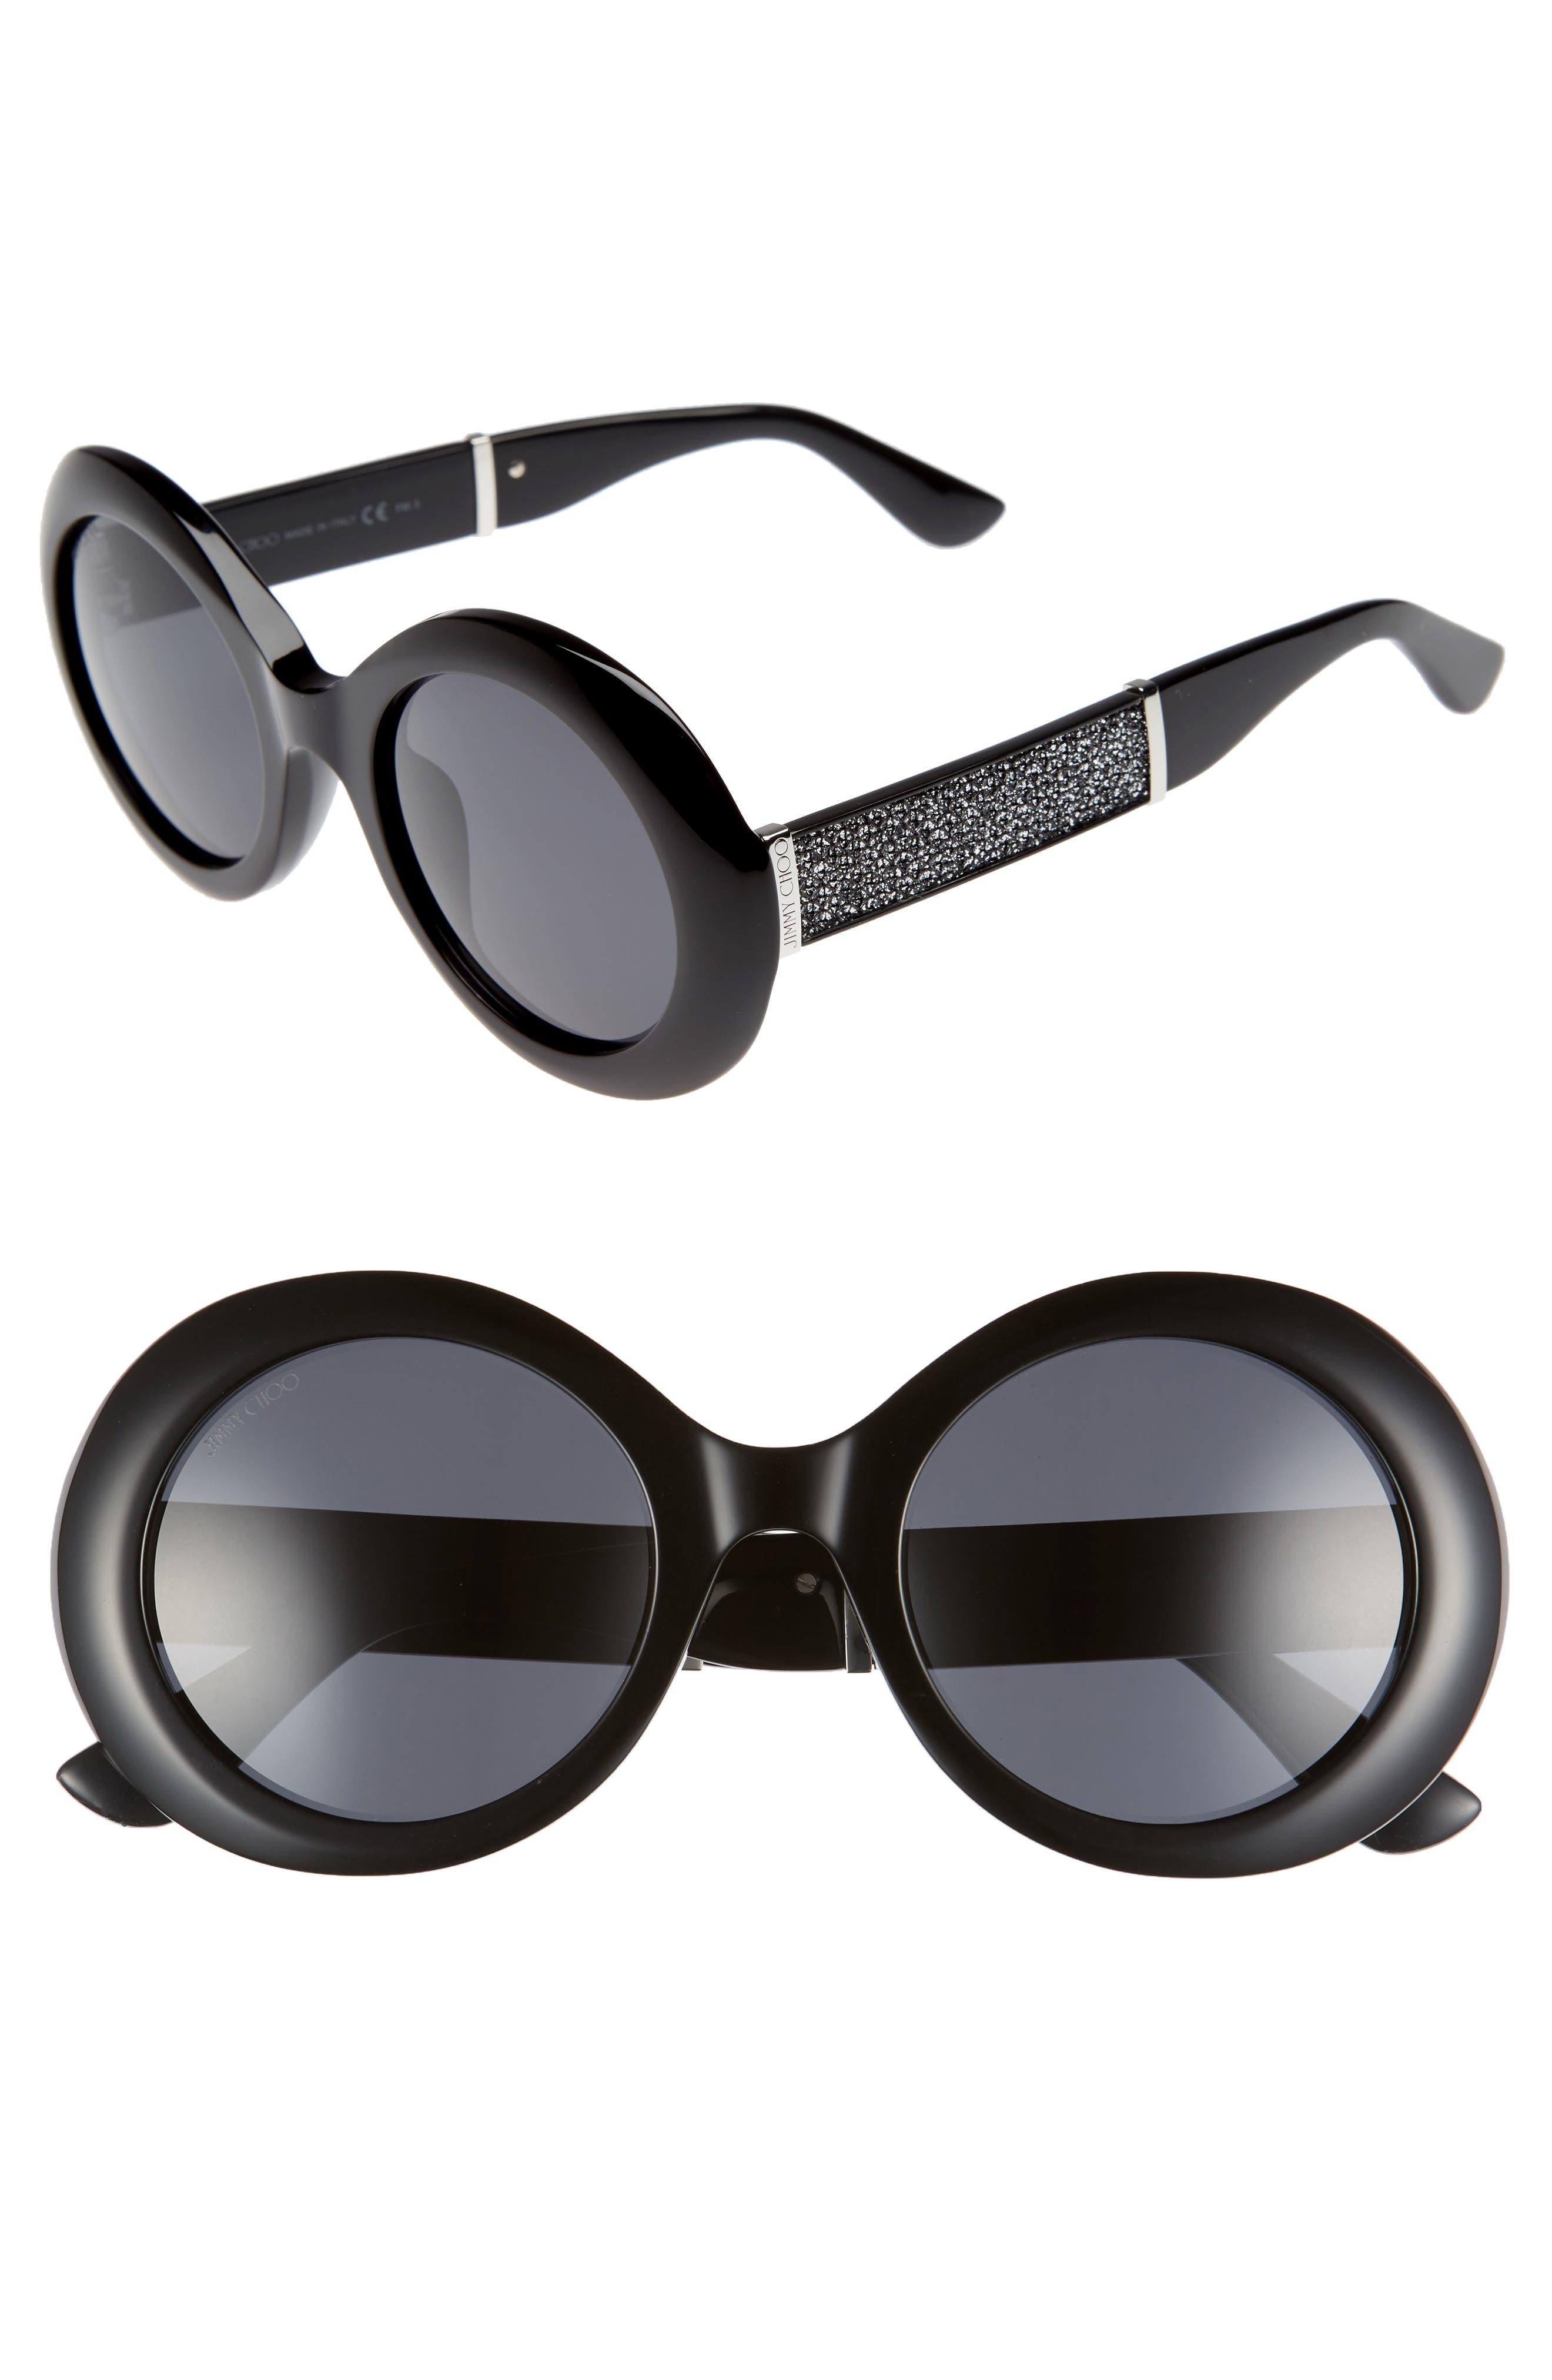 Wendy 51mm Round Sunglasses,                         Main,                         color, Black/ Glitter/ Black